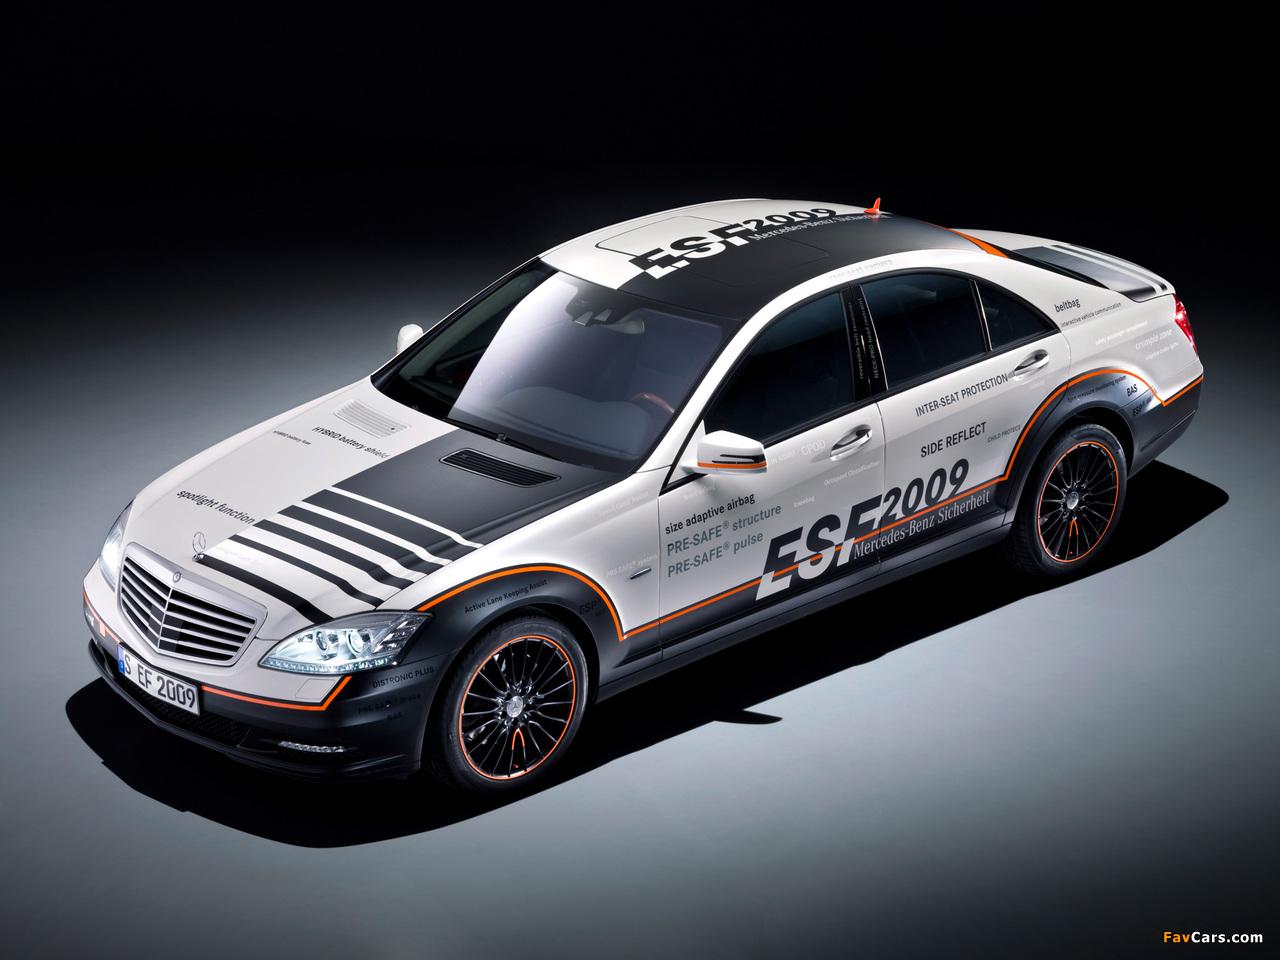 Mercedes-Benz S 400 Hybrid ESF Concept (W221) 2009 images (1280 x 960)